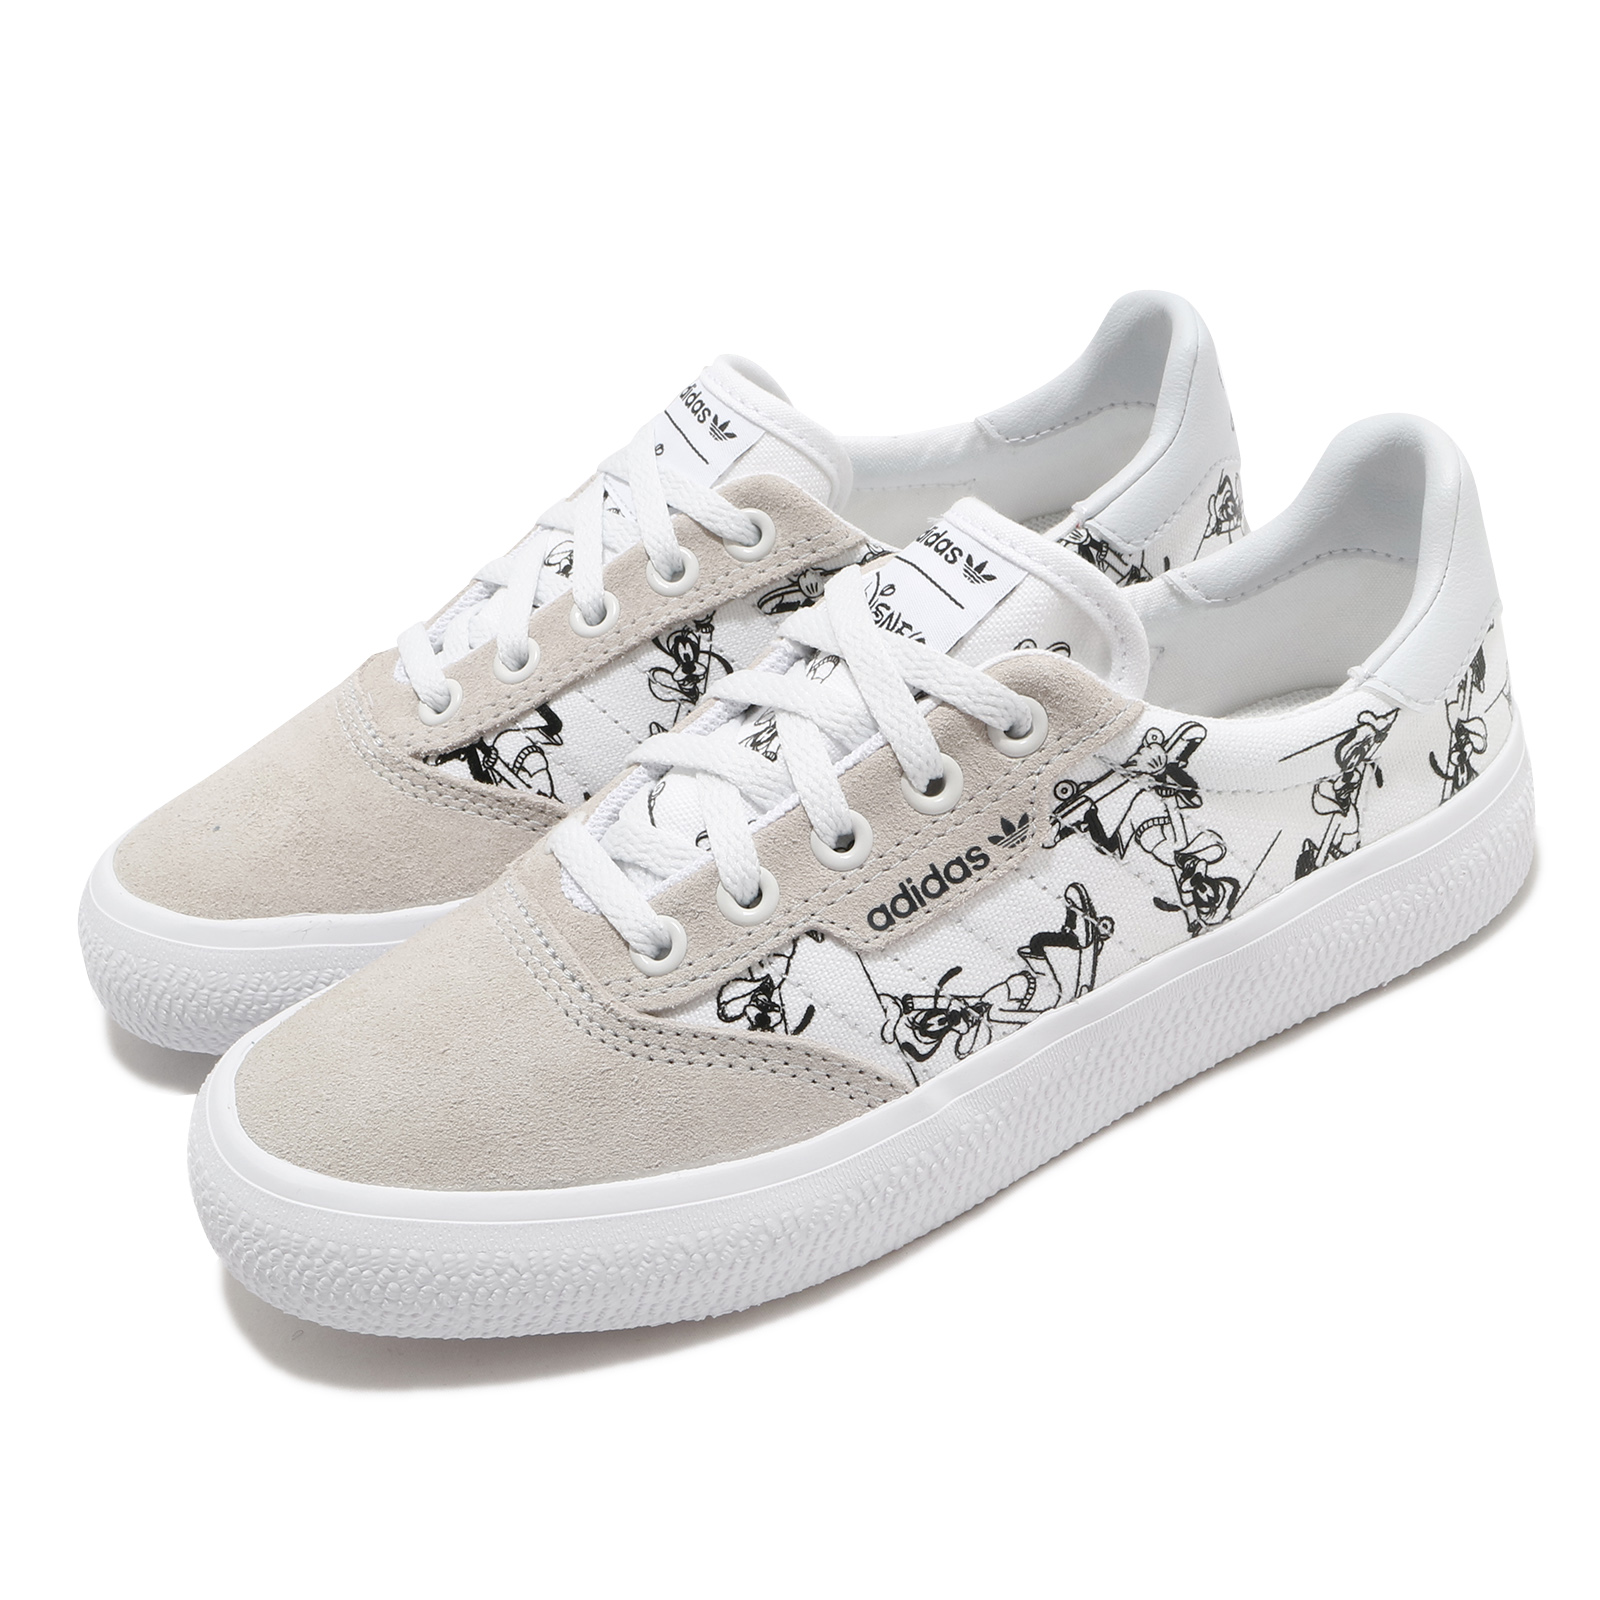 adidas 休閒鞋 3MC X Disney Sport 男女鞋 愛迪達 三葉草 迪士尼 高飛 聯名 情侶鞋 白黑 FW6240 FW6240